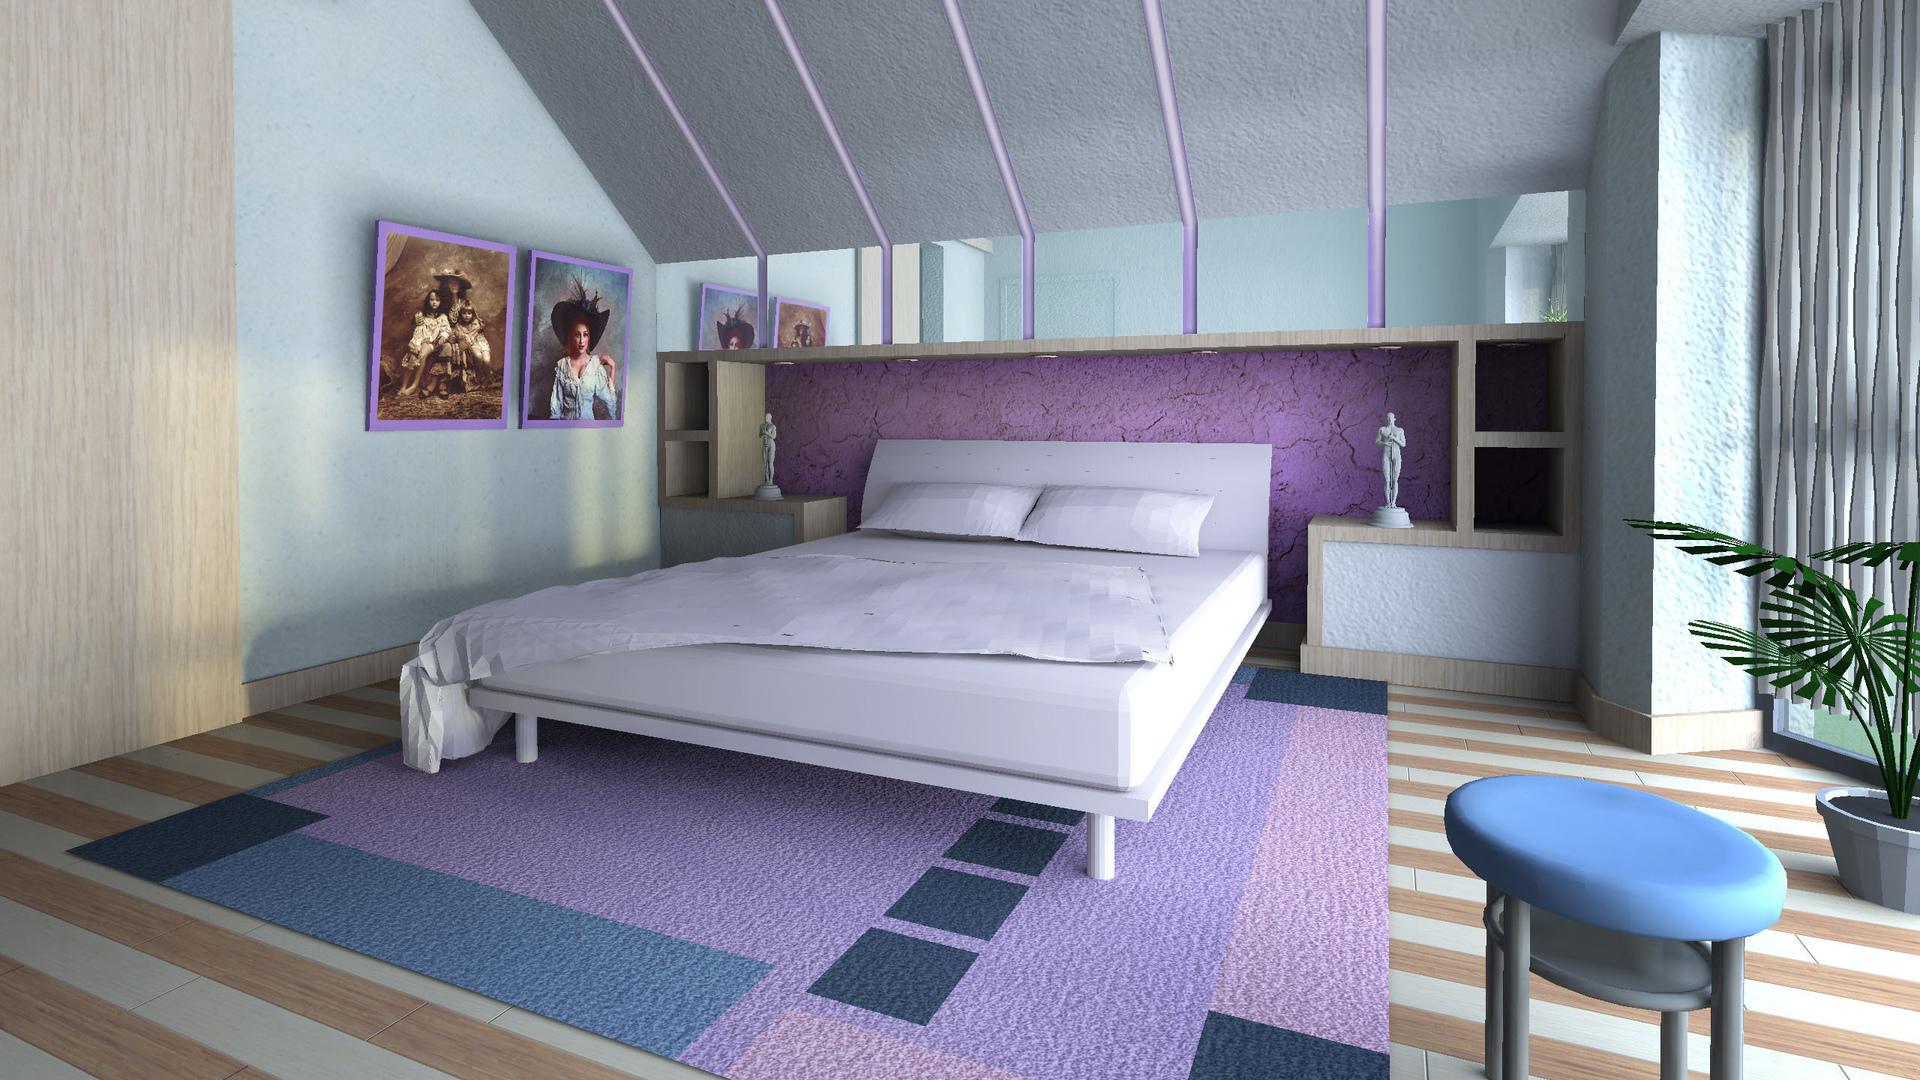 Фото дизайн интерьера комнат дома